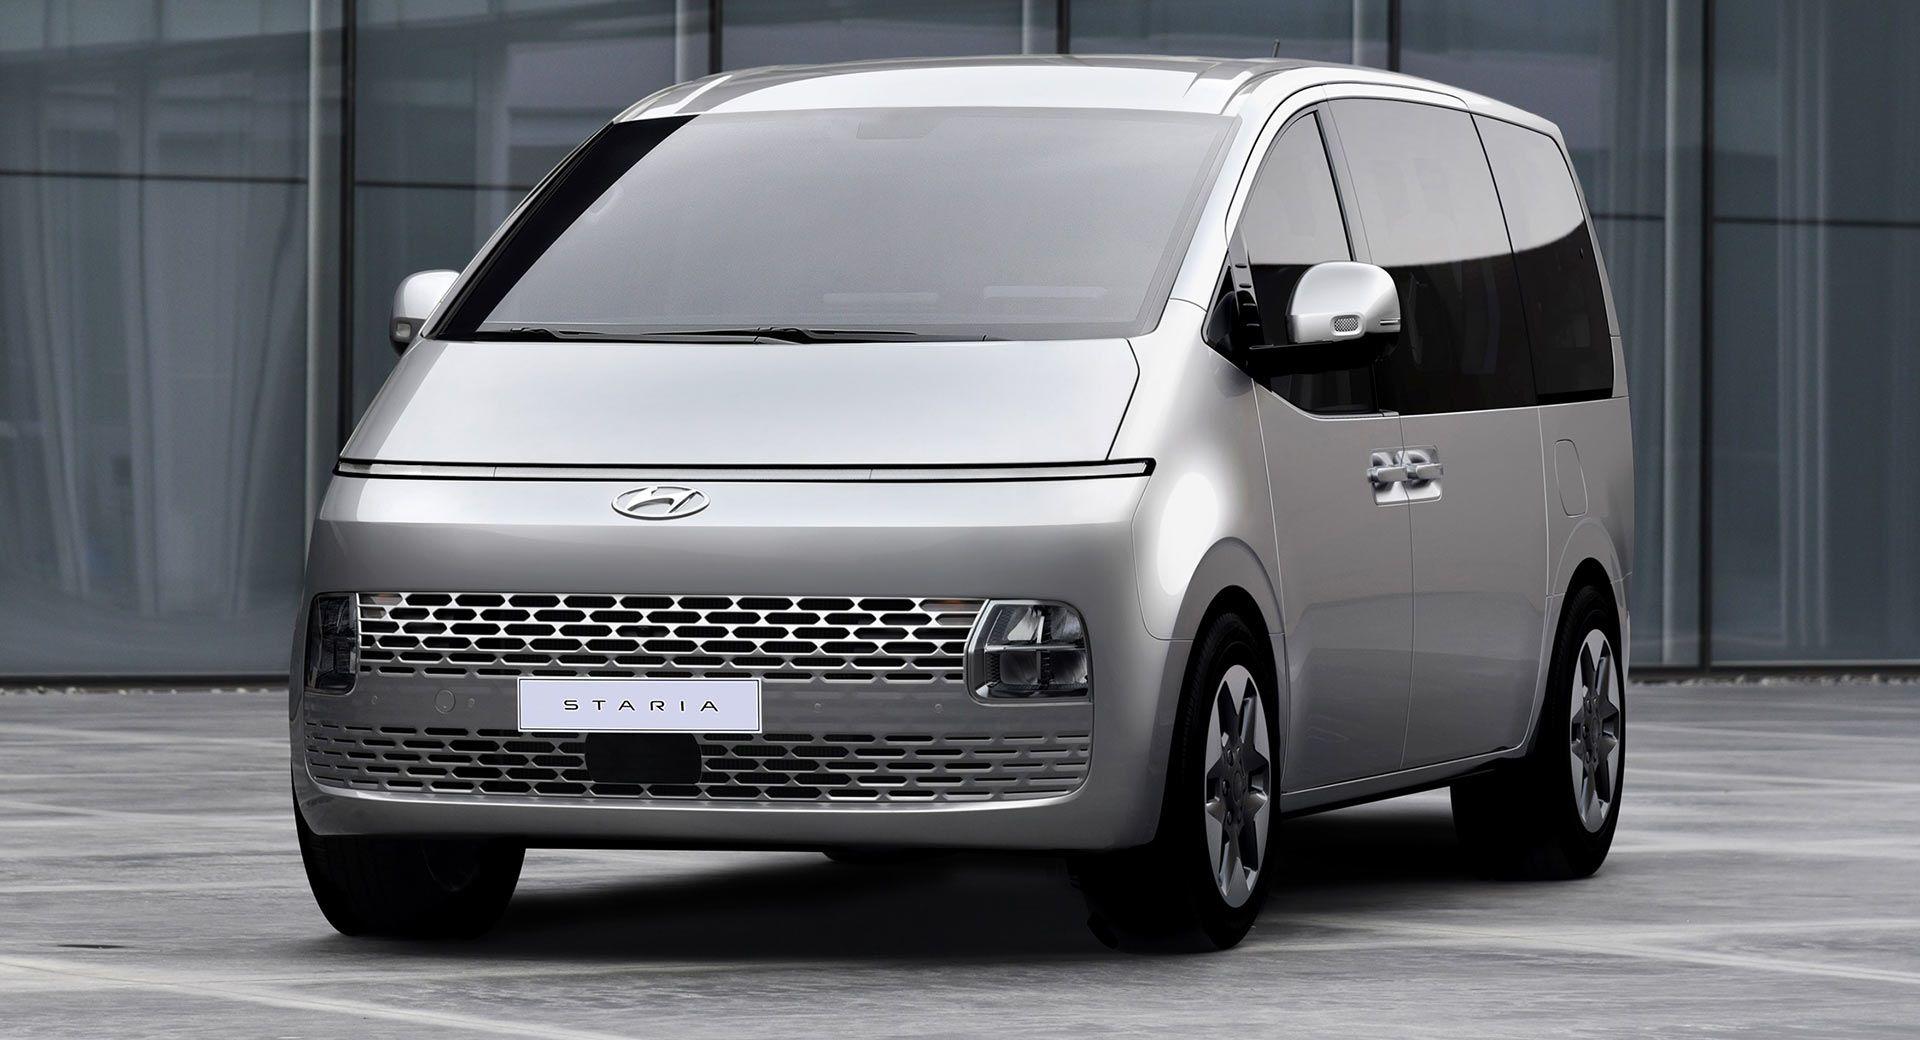 Hyundai-Staria-9